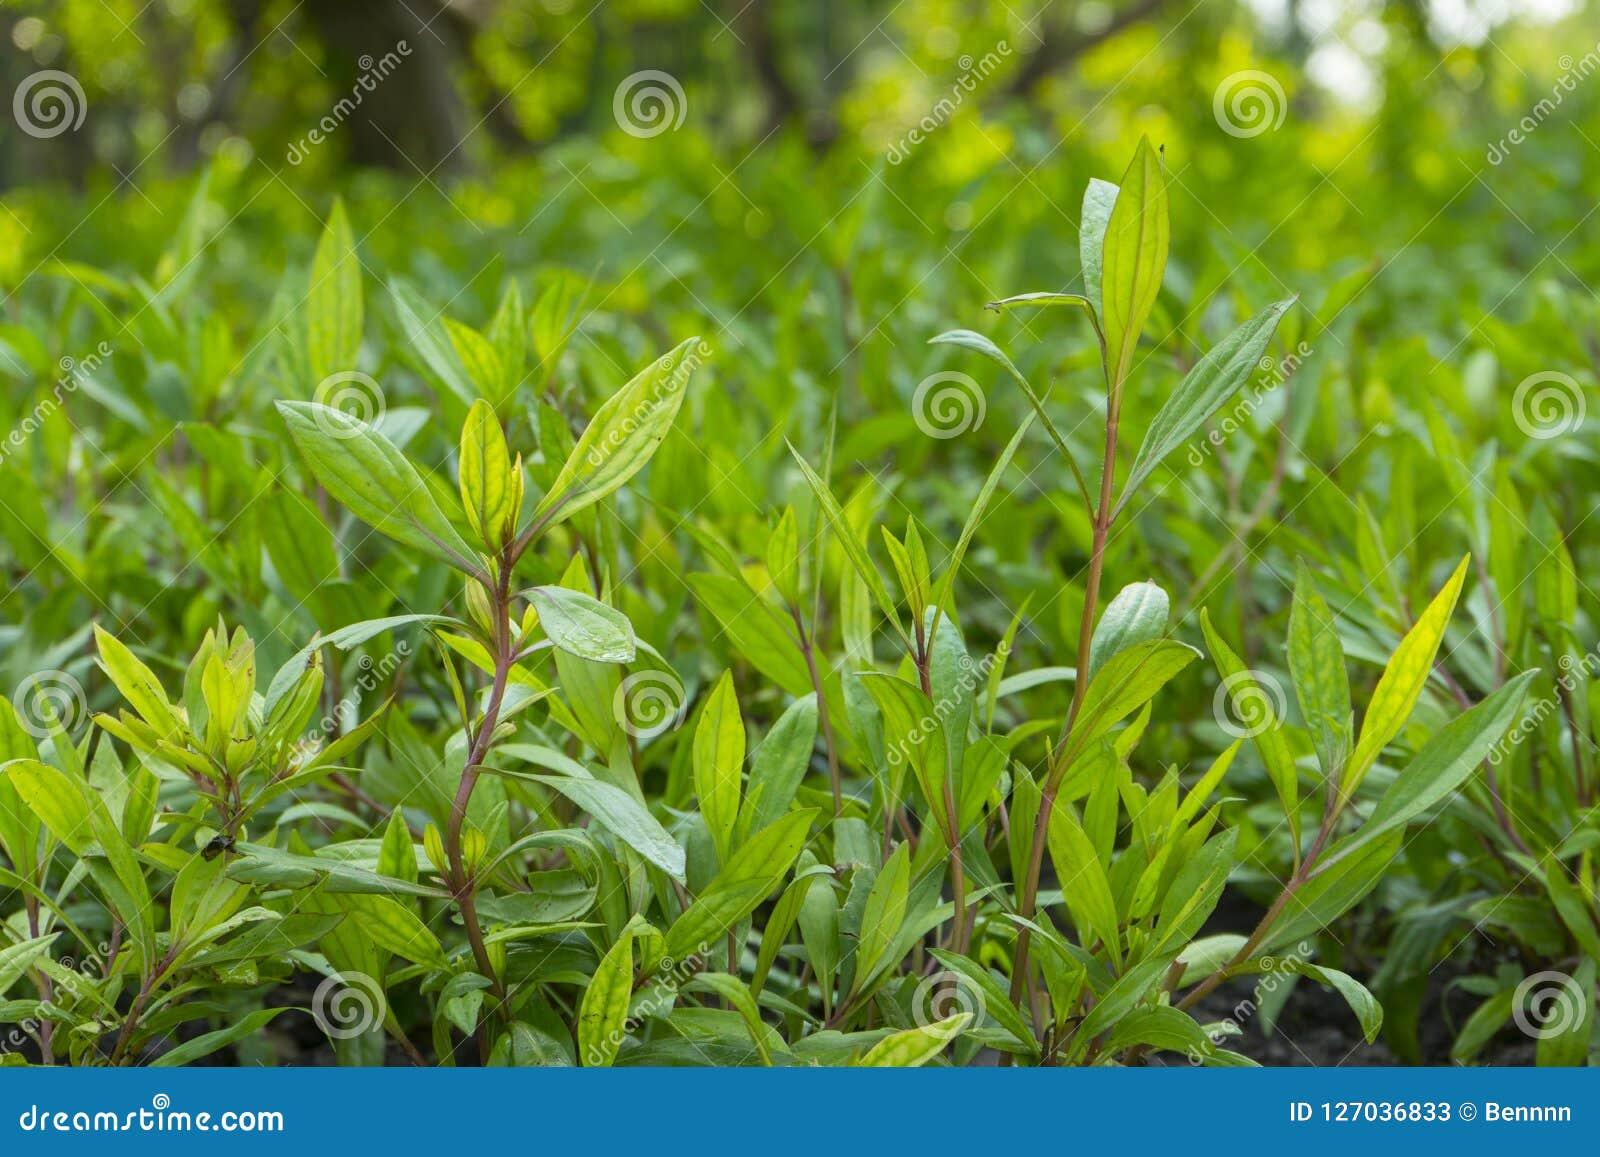 Eupatorium fortunei turcz. plant